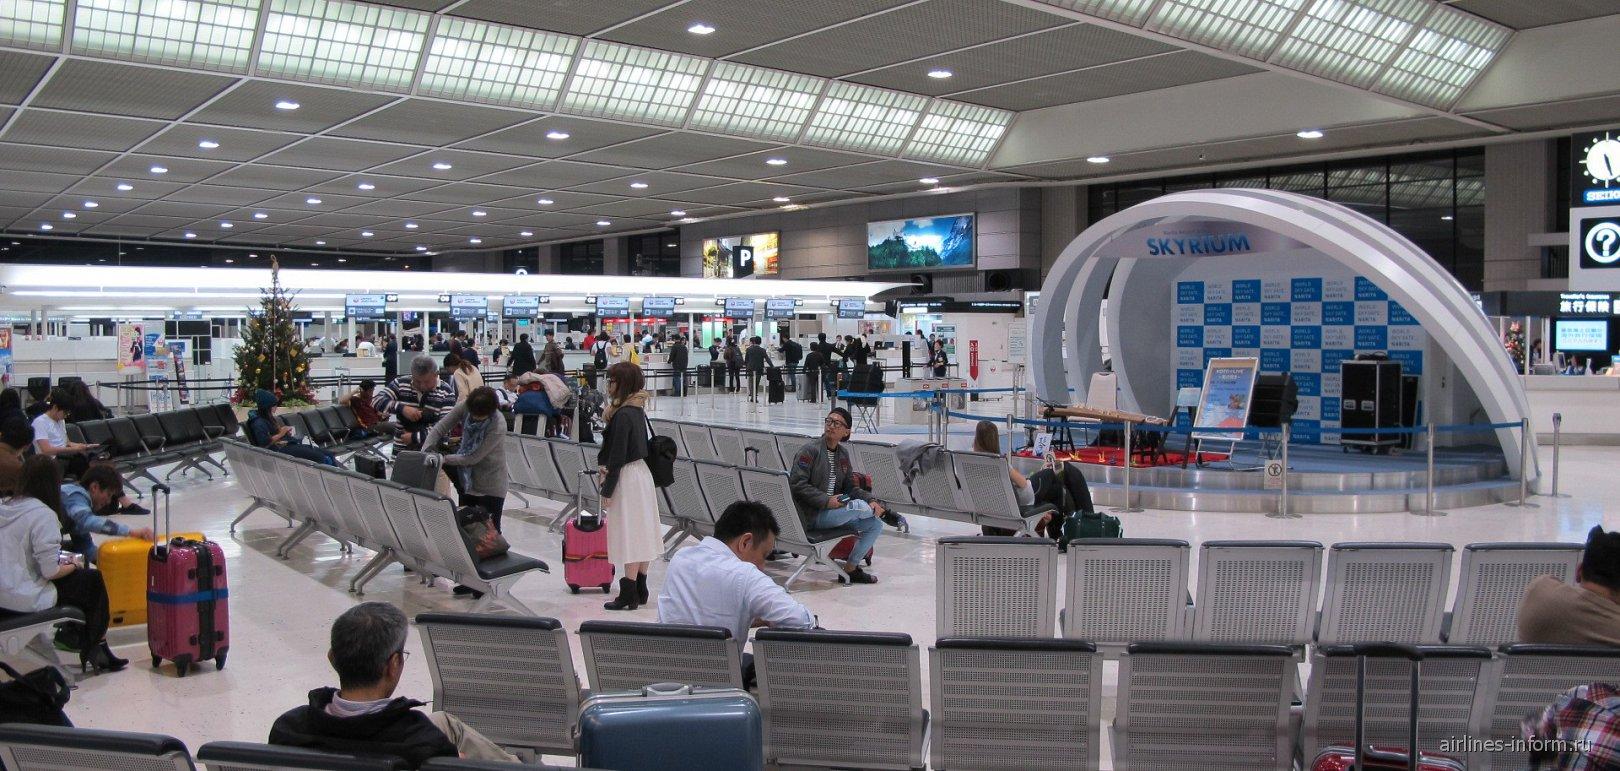 Сцена в терминале 2 аэропорта Токио Нарита